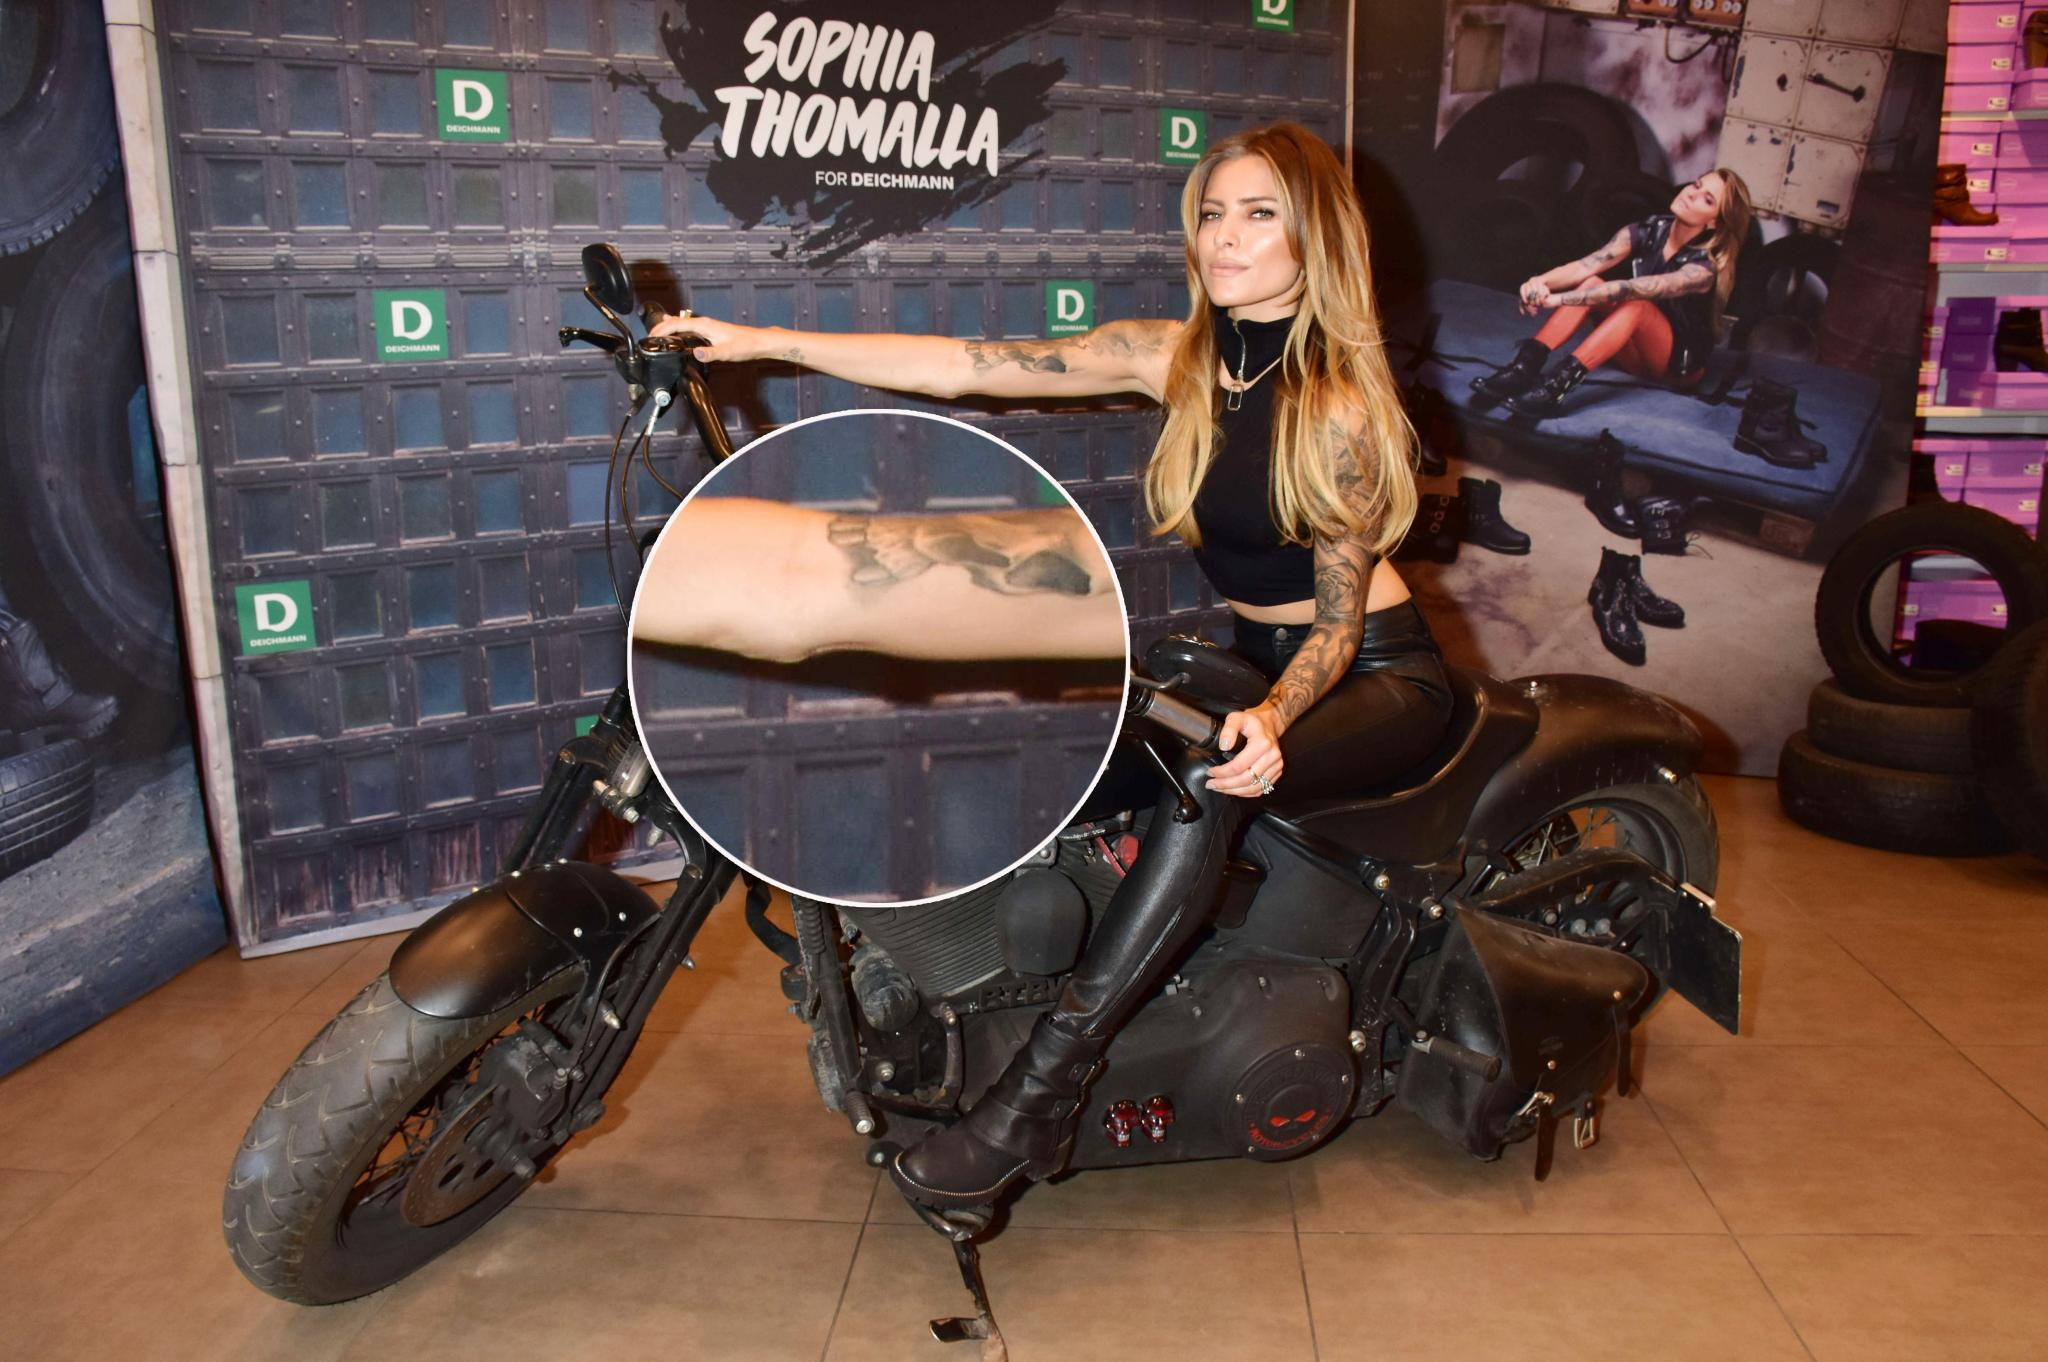 Sophia Thomalla: Sophia Thomalla präsentiert ganz offen ihre XL-Narbe.